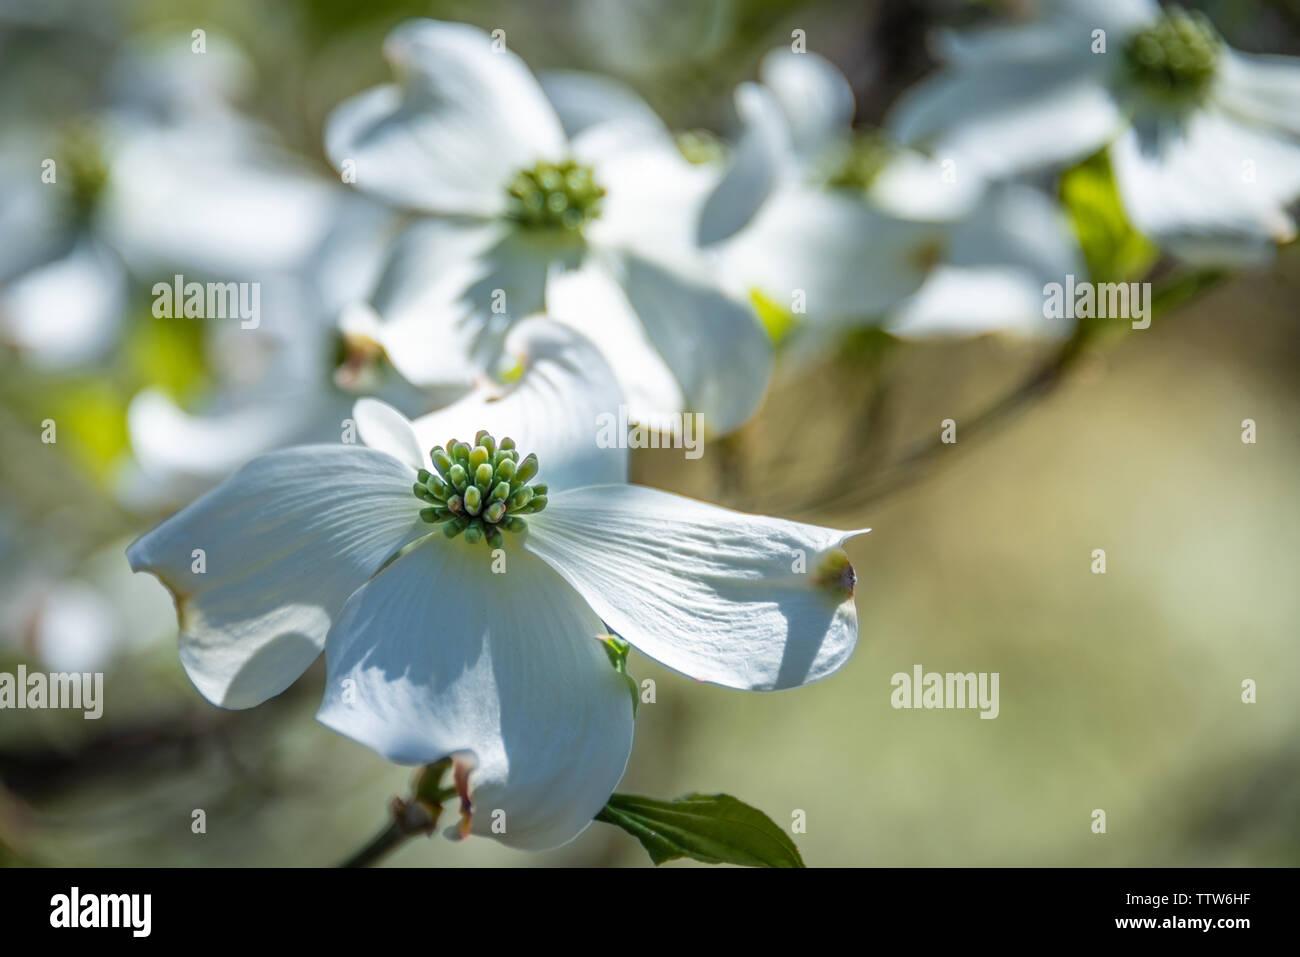 White dogwood blossoms. Stock Photo